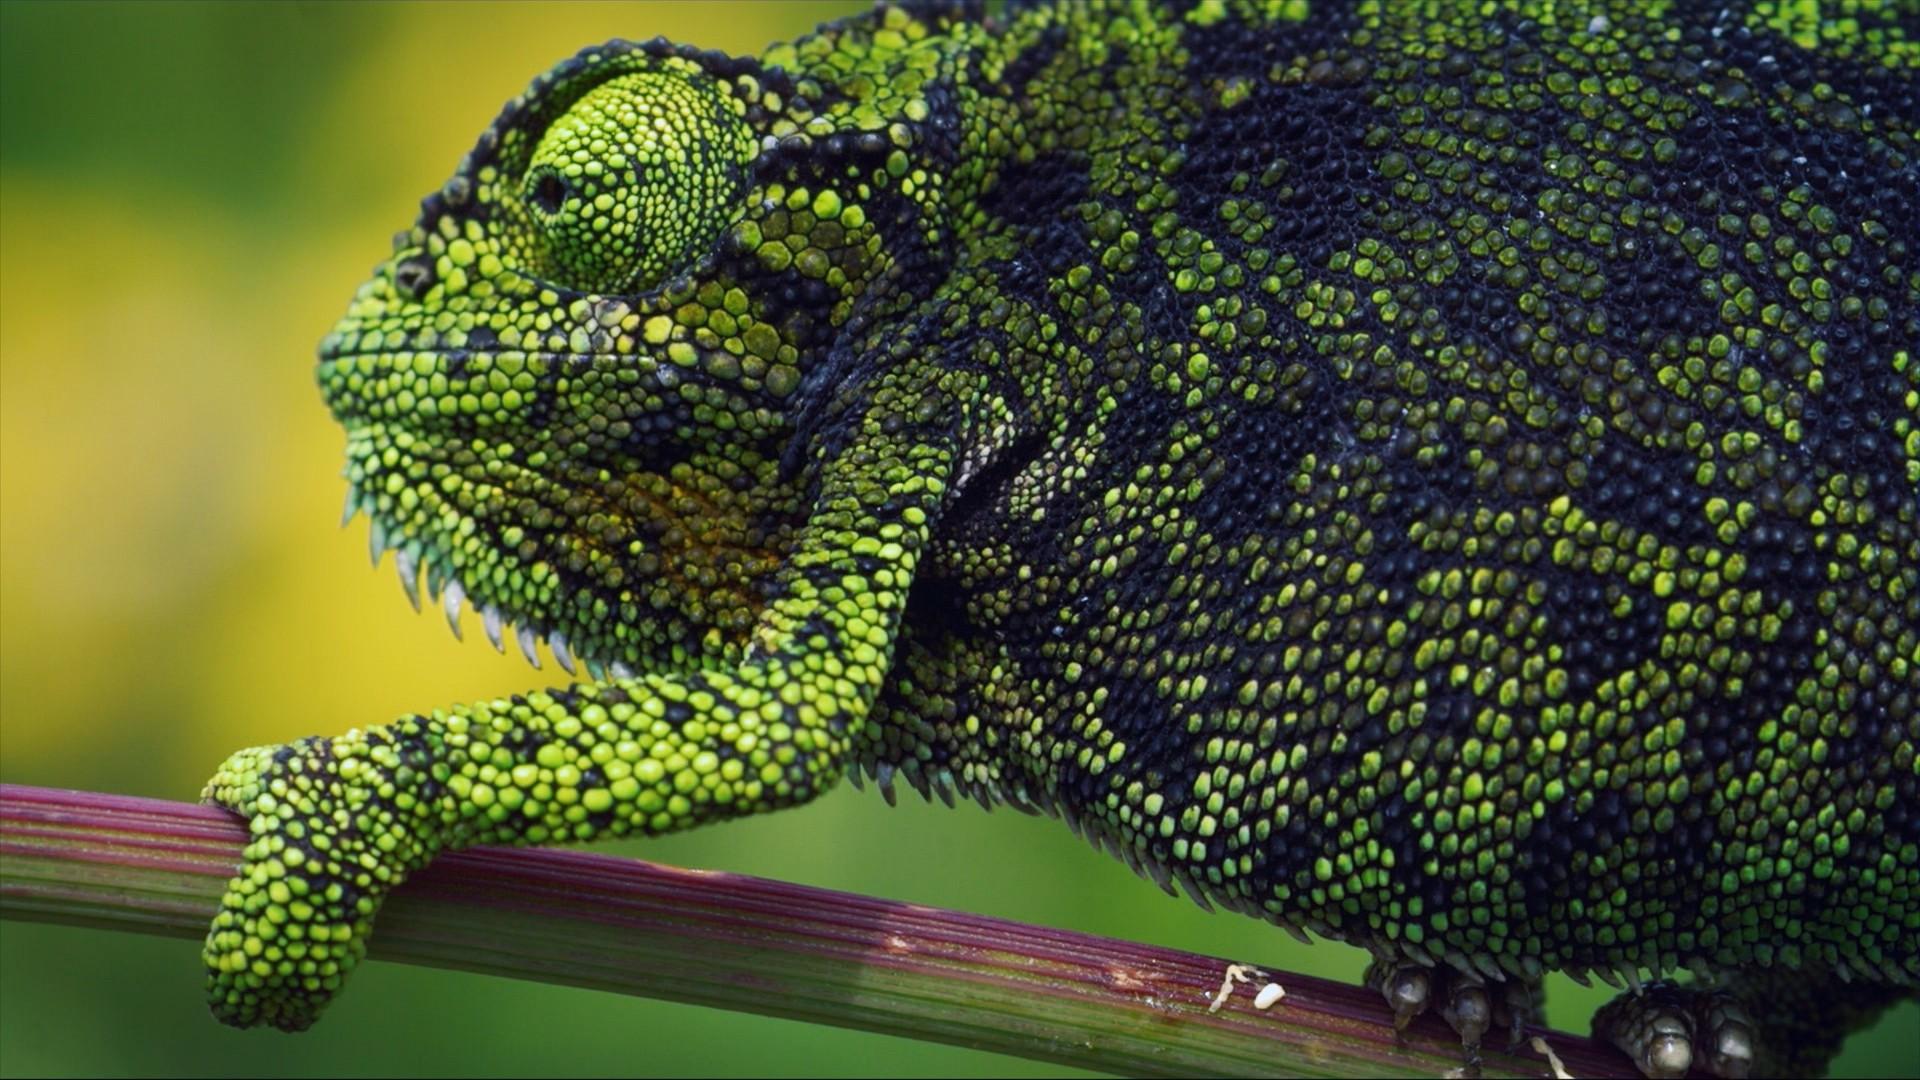 Spektakulární wild-life i vědecké fun facty